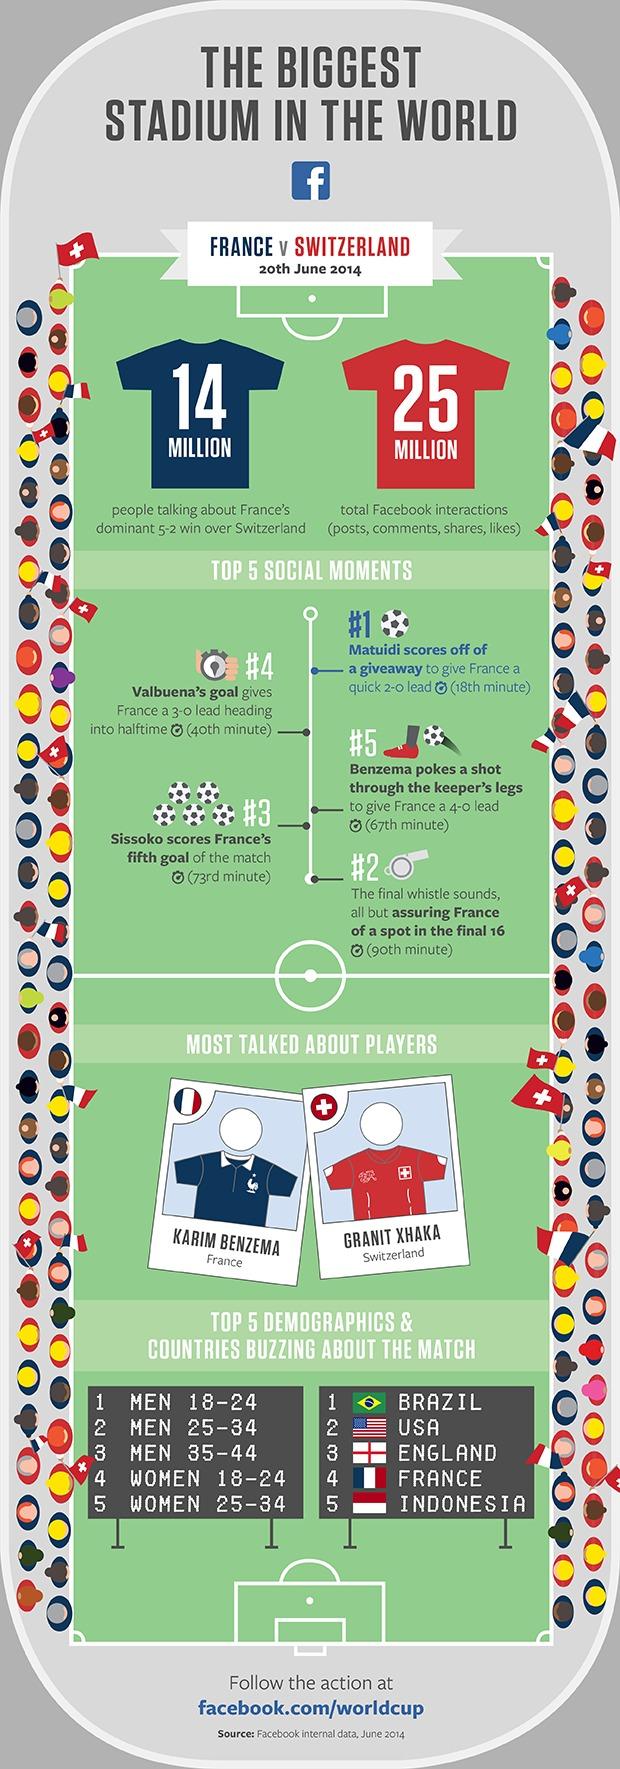 Coupe du Monde de football : Coupe du Monde sur Facebook